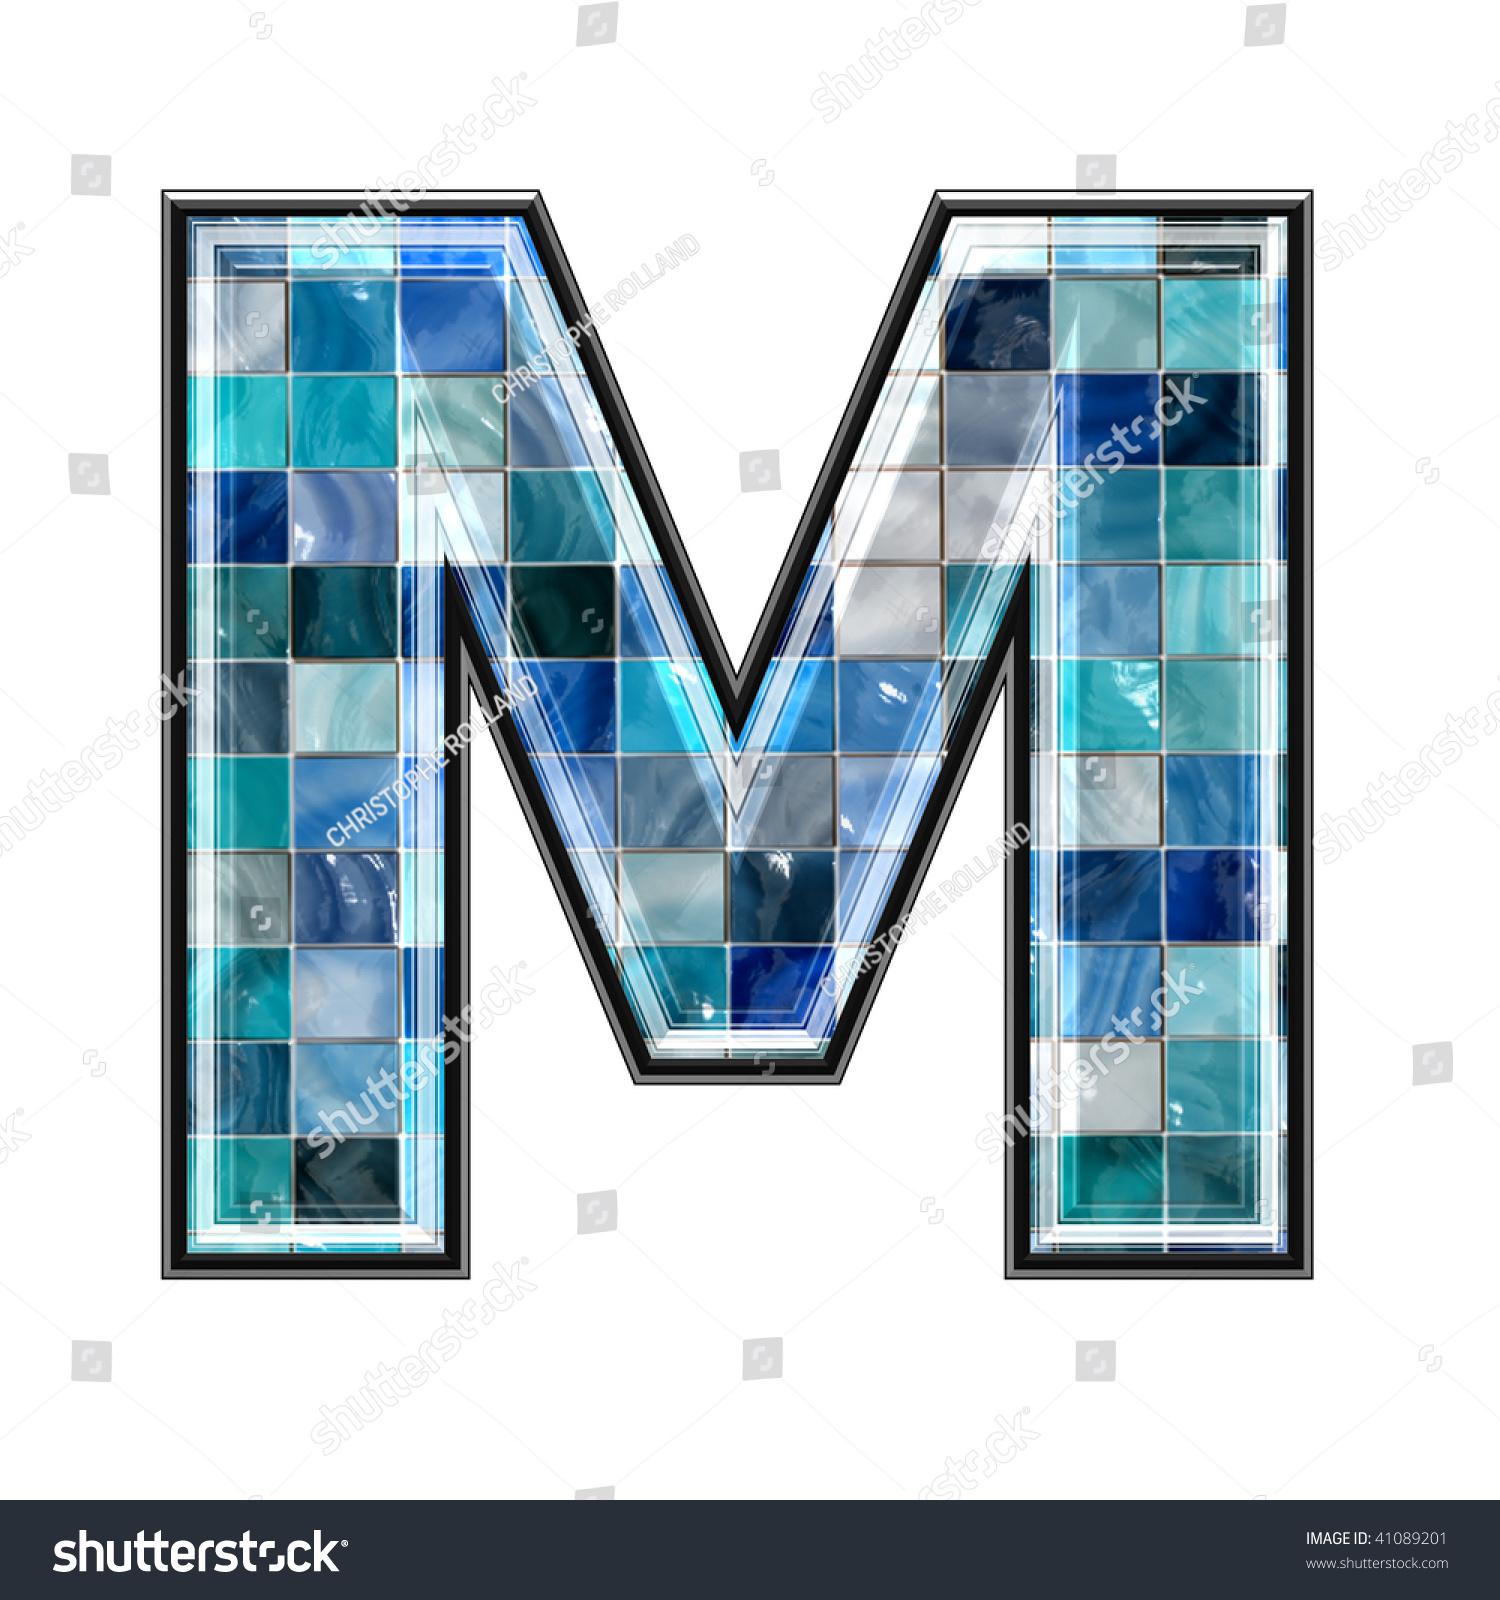 Ceramic alphabet tiles choice image tile flooring design ideas ceramic alphabet tiles choice image tile flooring design ideas alphabet ceramic tiles image collections tile flooring doublecrazyfo Gallery